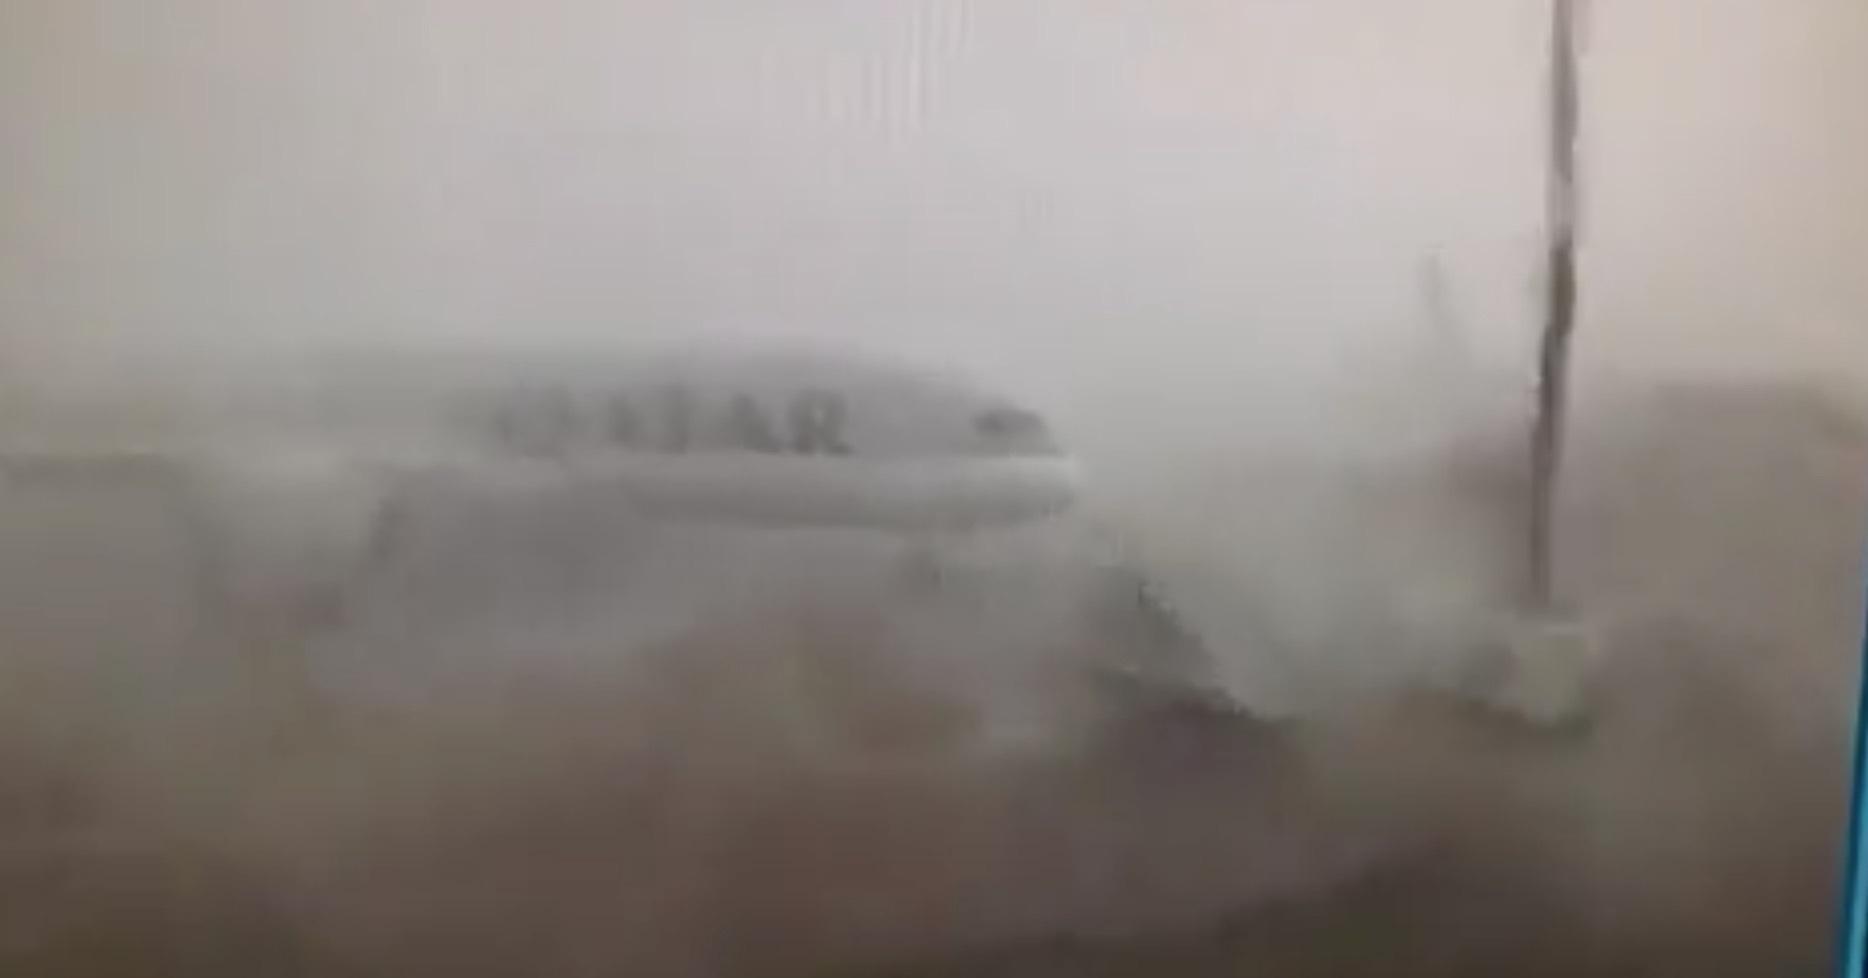 Qatar 787 weathercocking in Doha